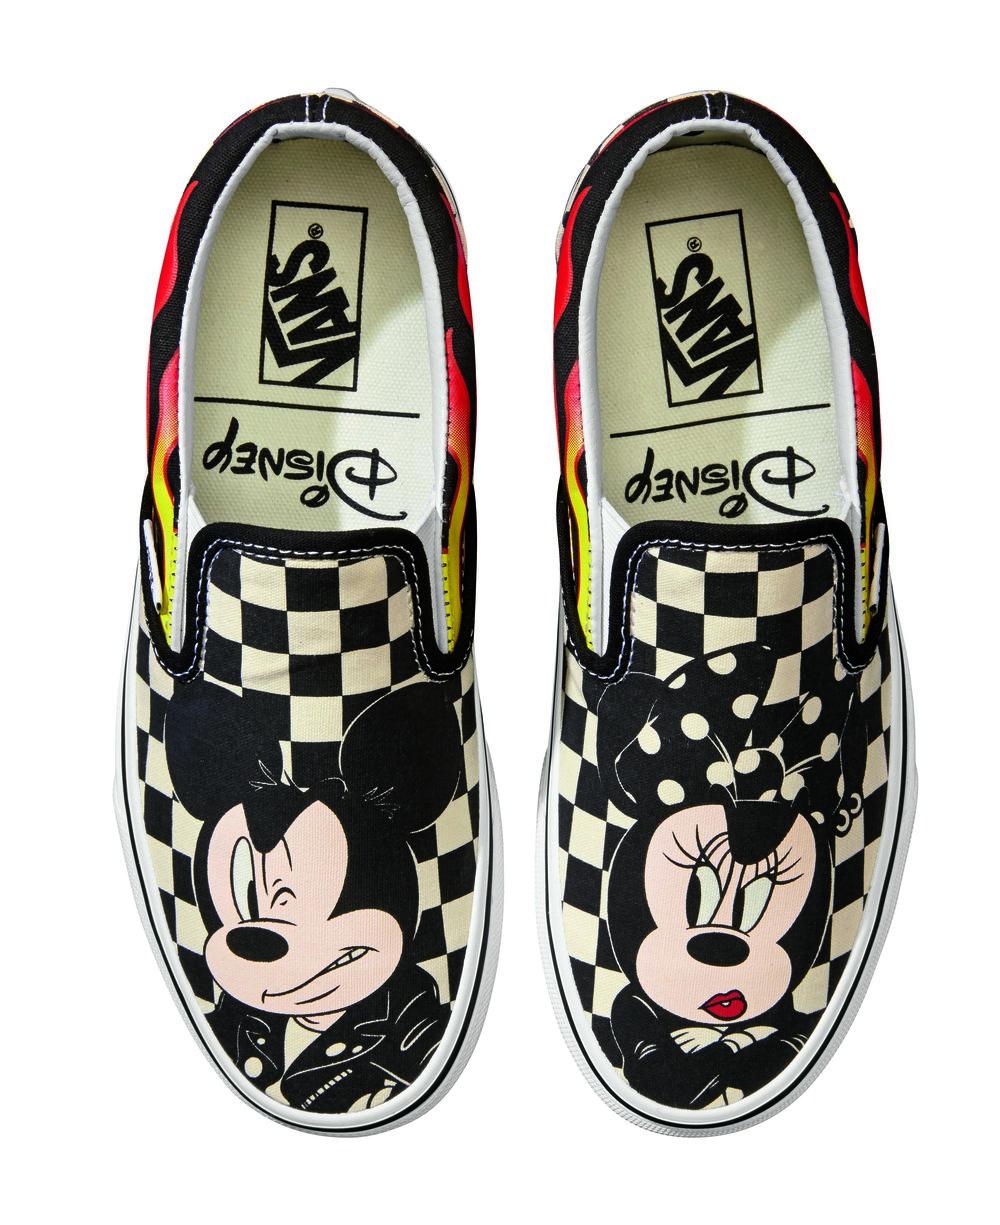 UCL_ Classic Slip-On_Disney_ Mickey - Minnie-checker flame_VN0A38F7UJ4-top.jpg